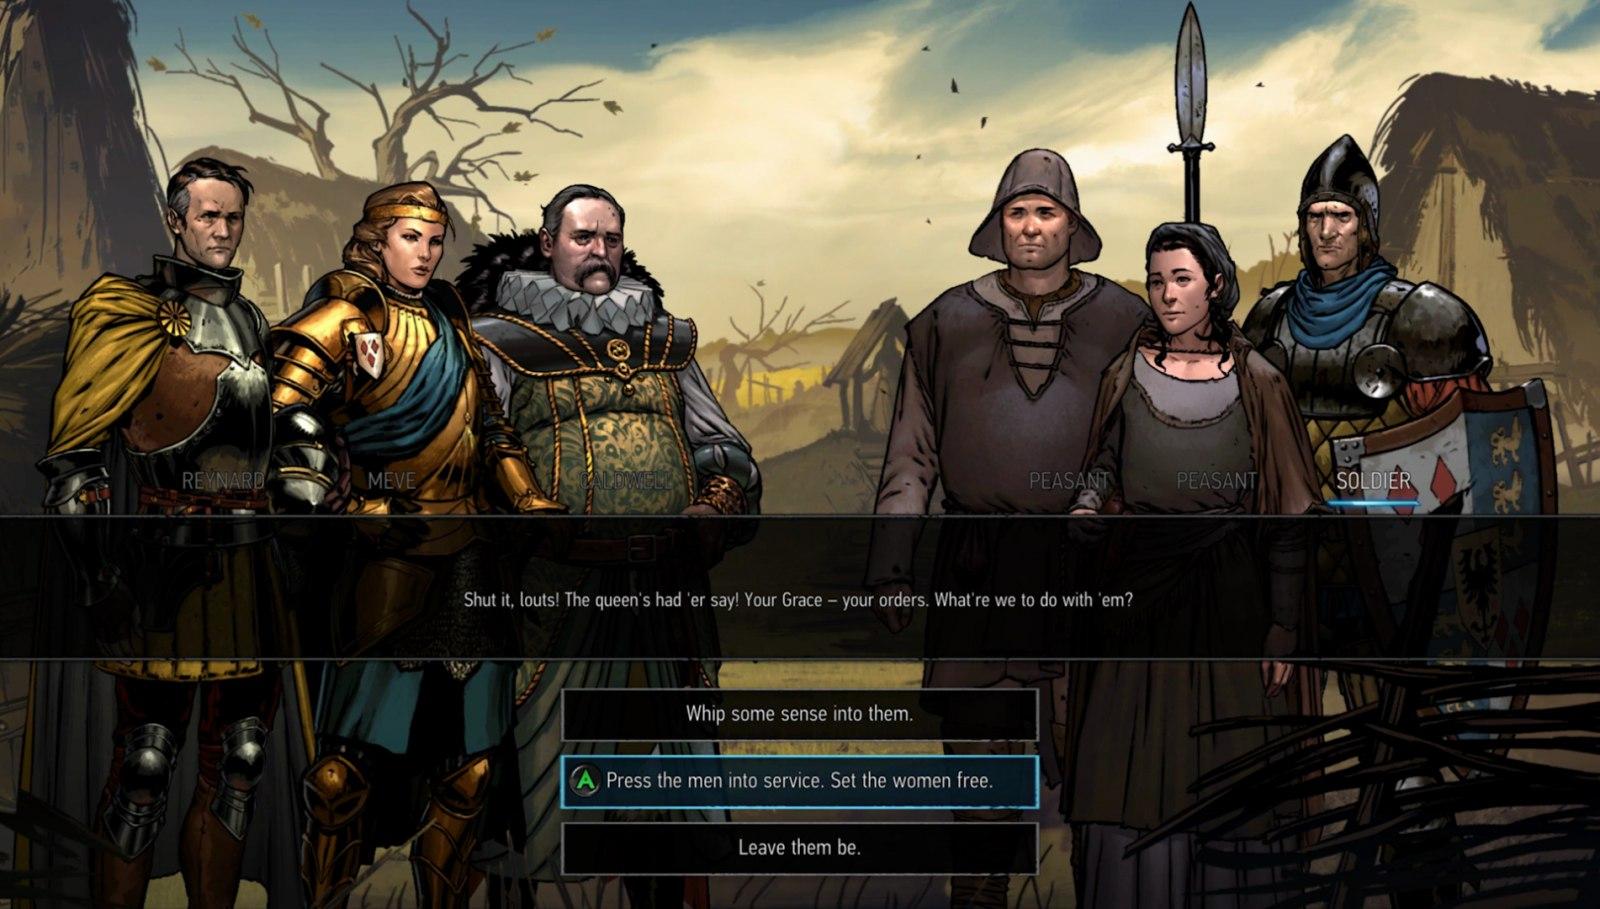 巫师之昆特牌:王权的陨落/Thronebreaker: The Witcher Tales插图3